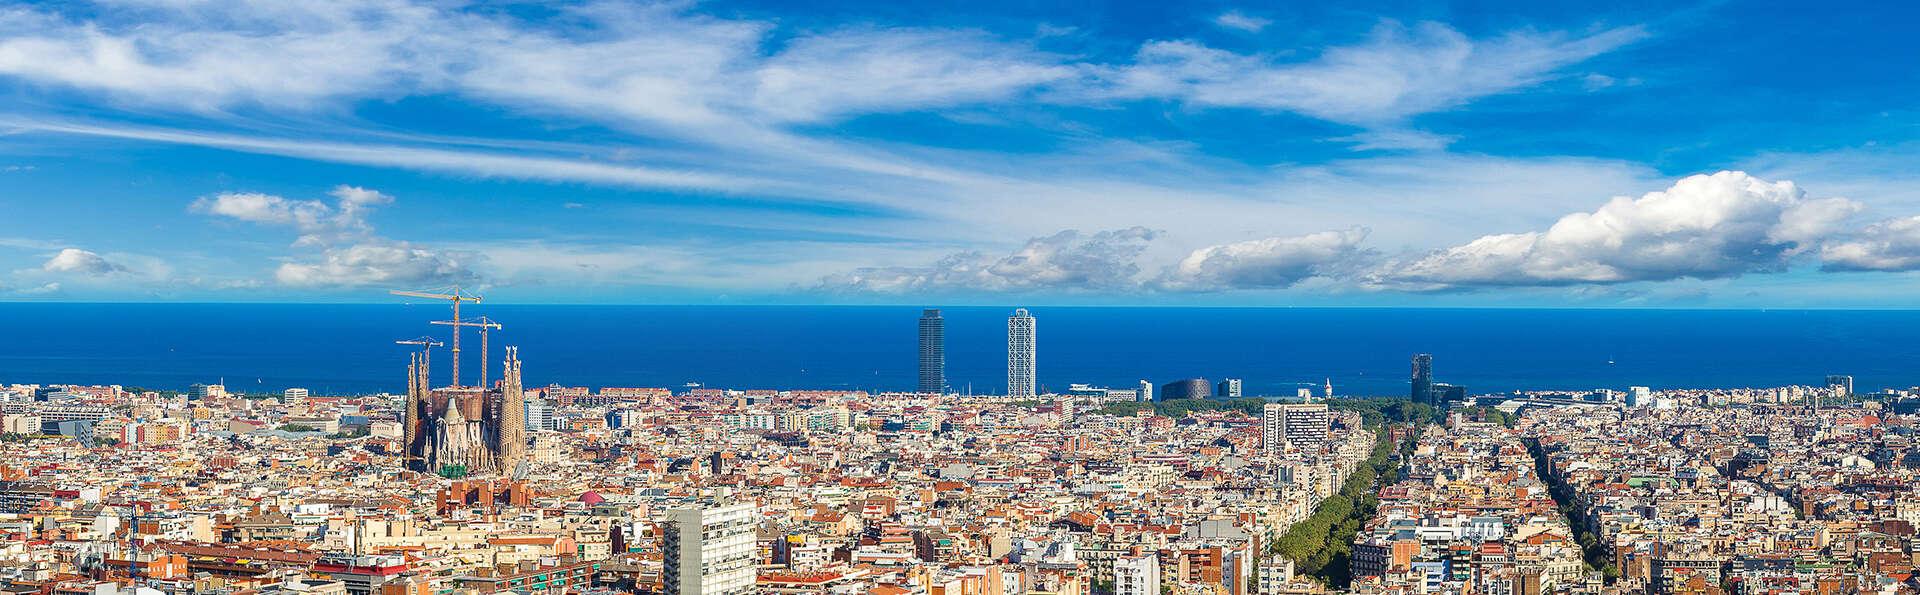 Descansa en un hotel 4* en pleno centro de Barcelona